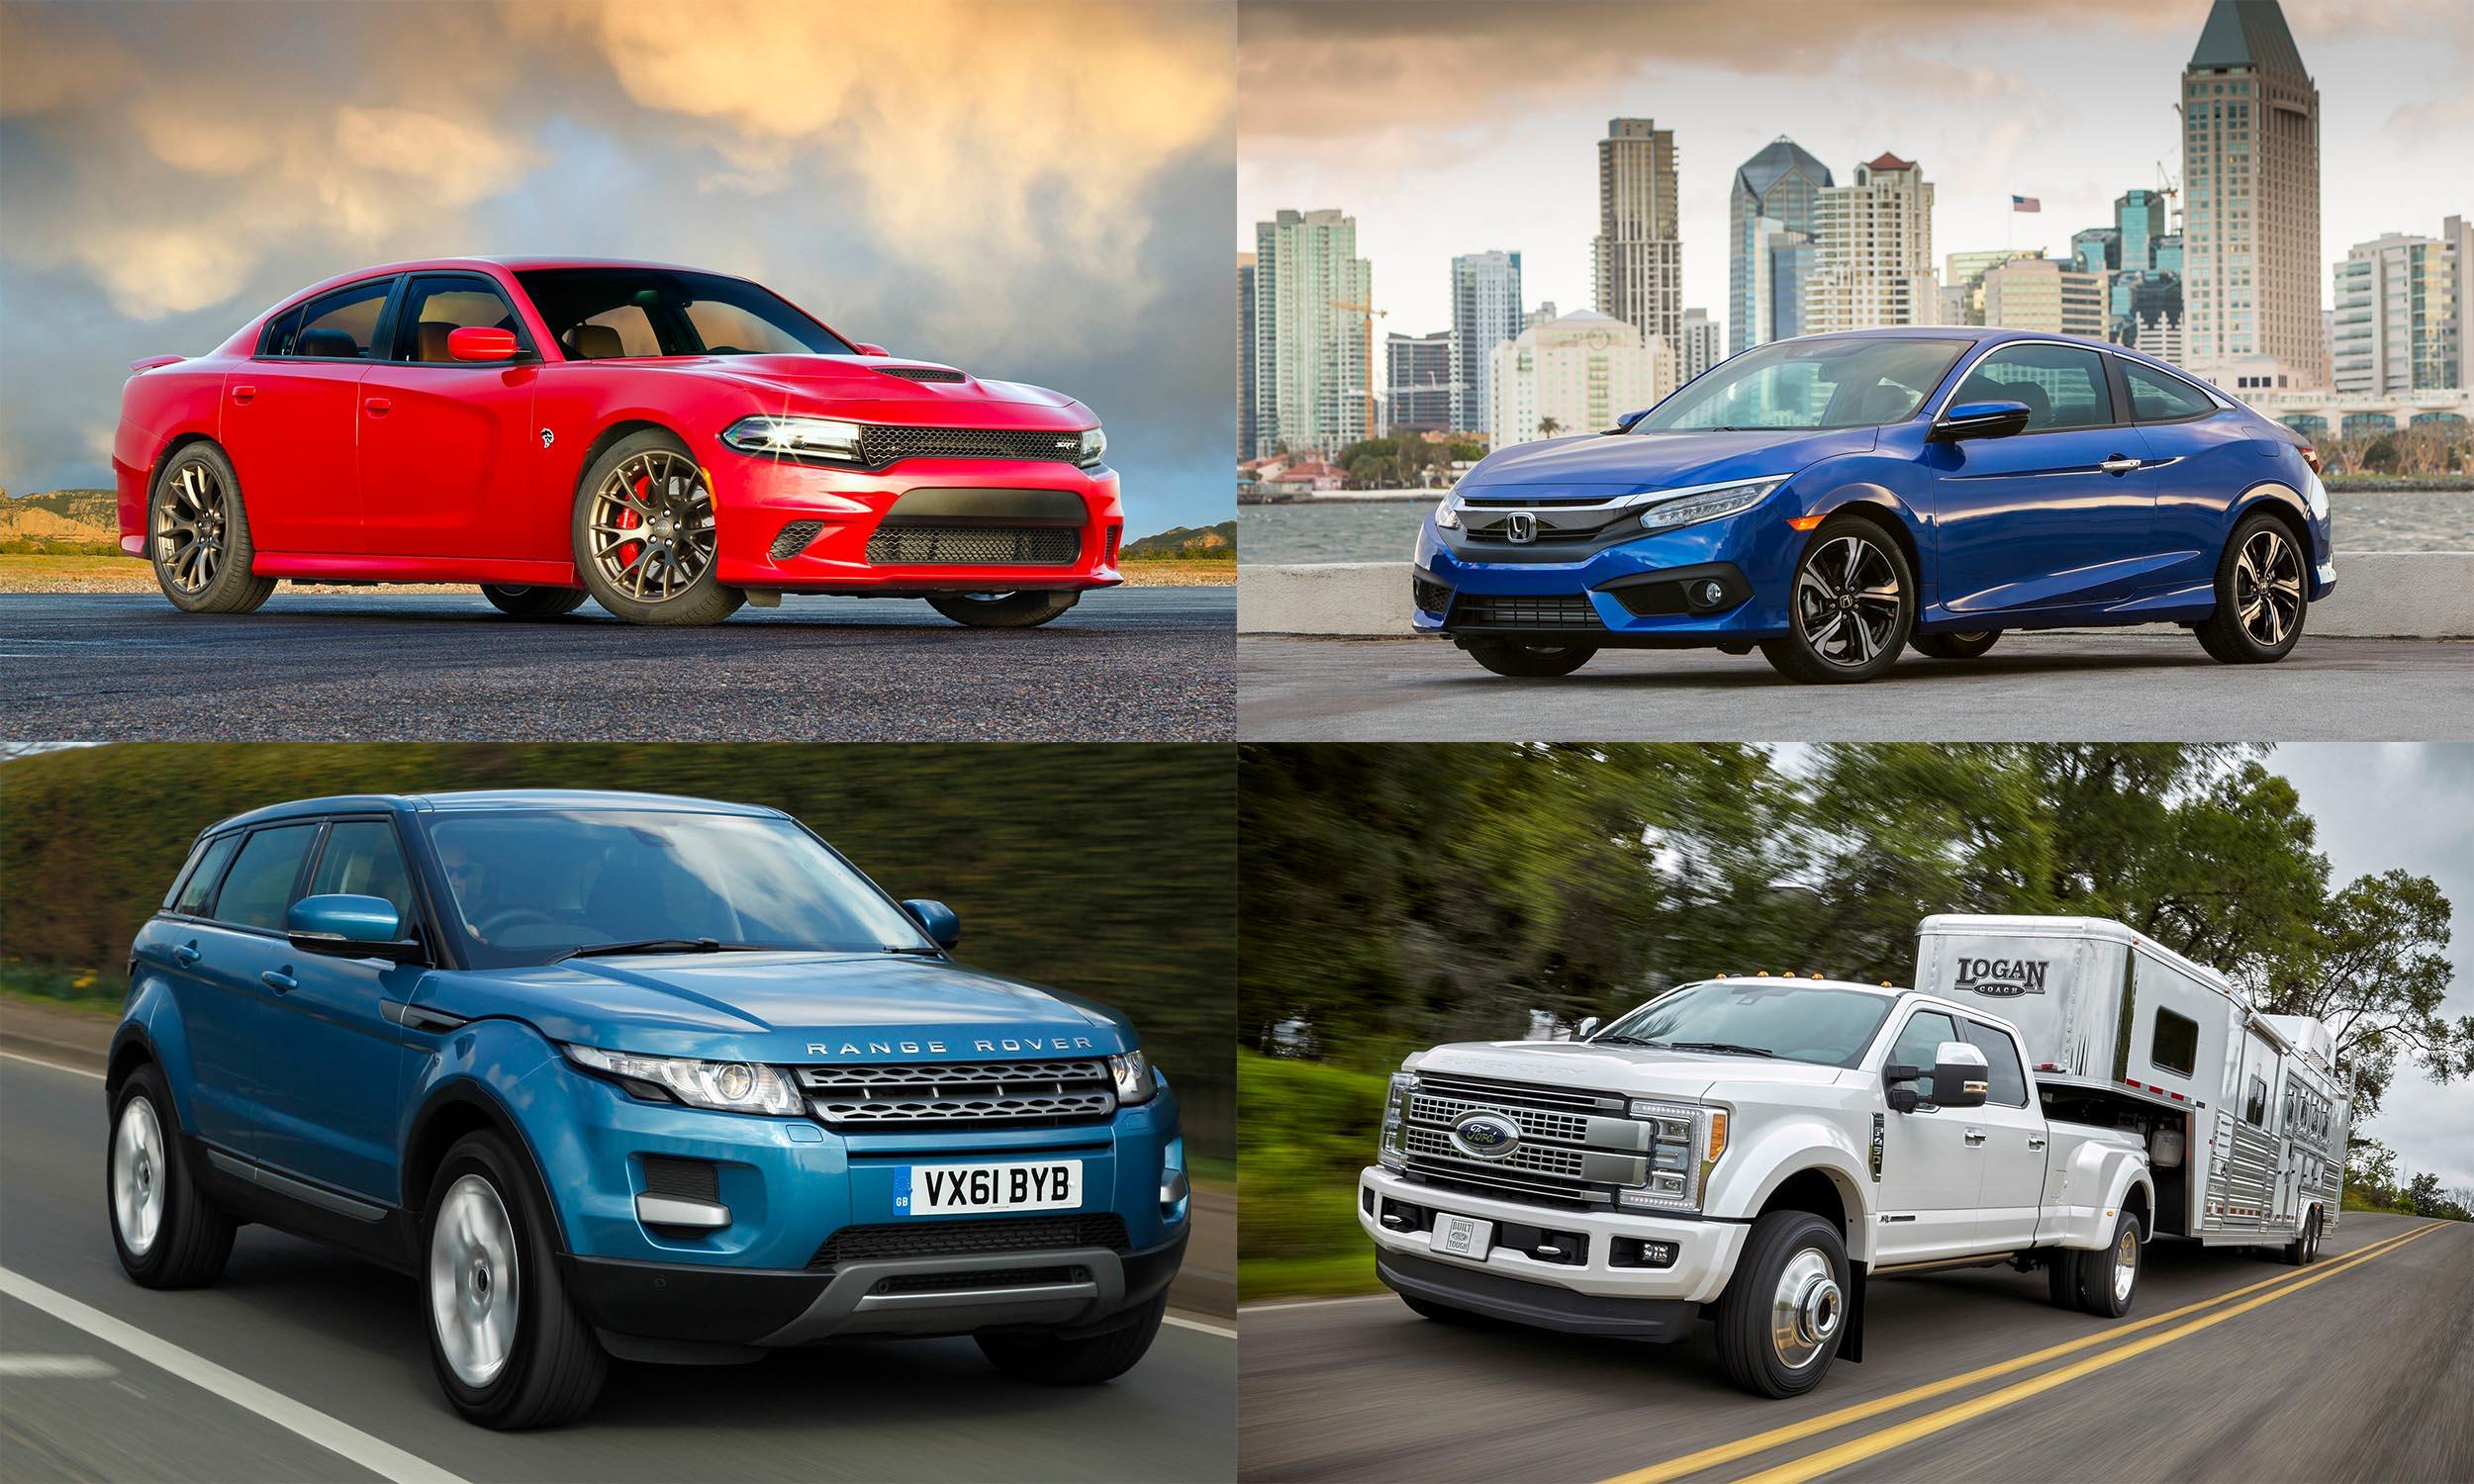 © FCA US, © Jaguar Land Rover, © American Honda Motors, © Ford Motor Company